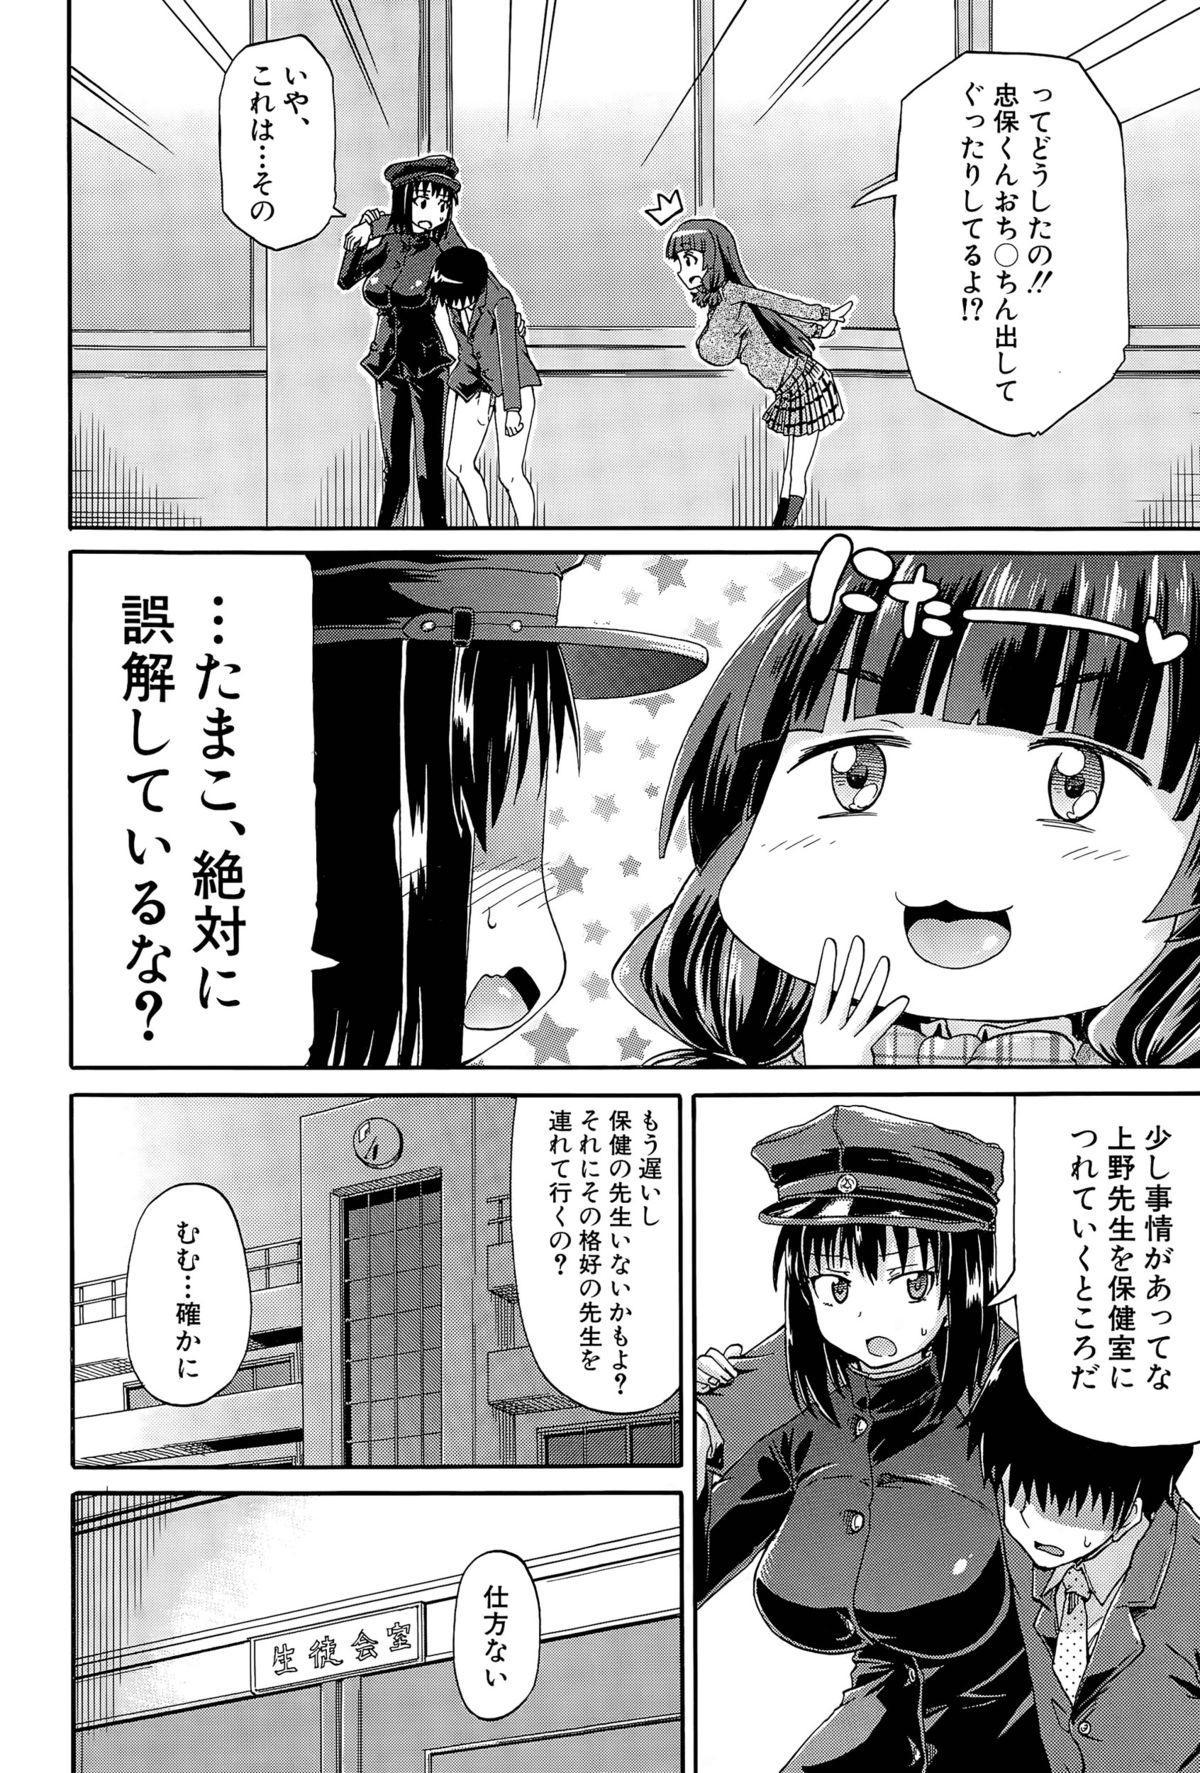 Shousui Awaremi!! Ch. 1-4 109